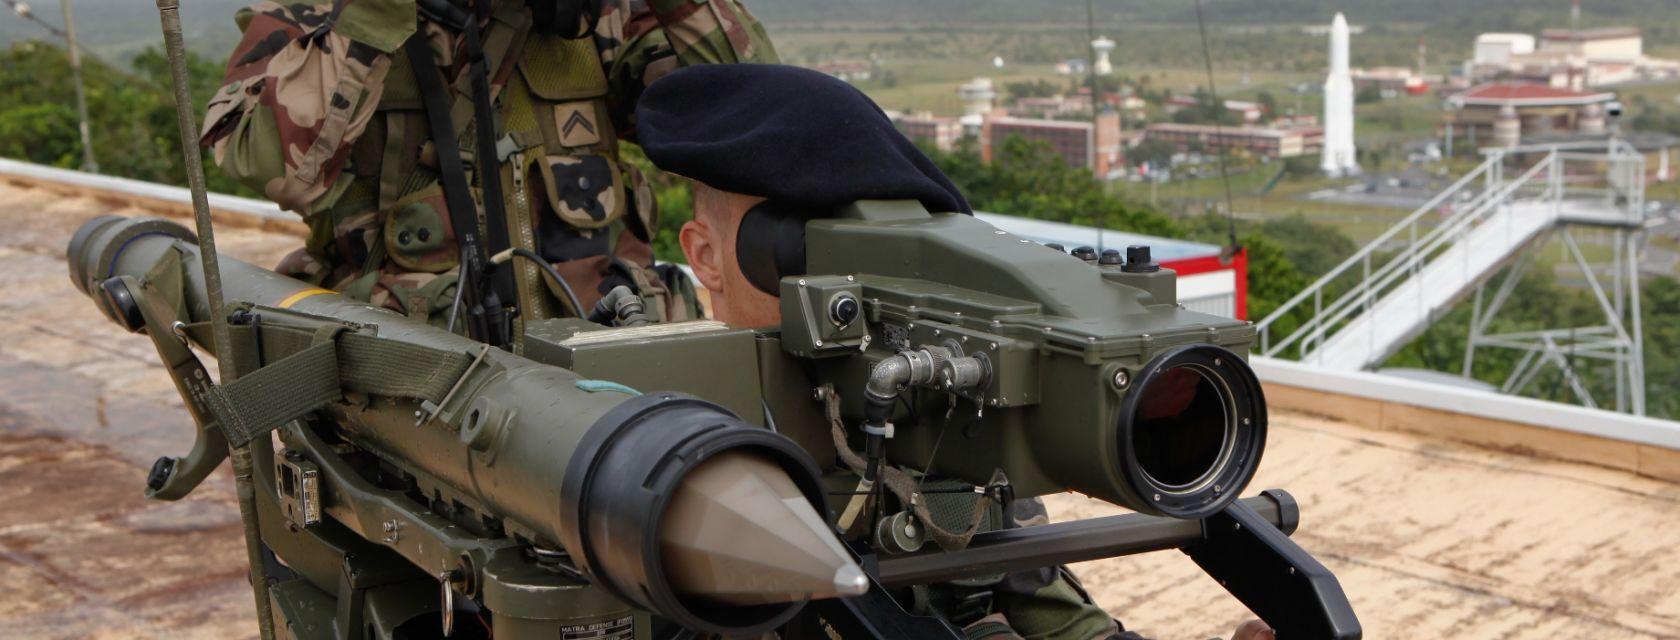 Serbia orders MBDA's Mistral 3 missiles